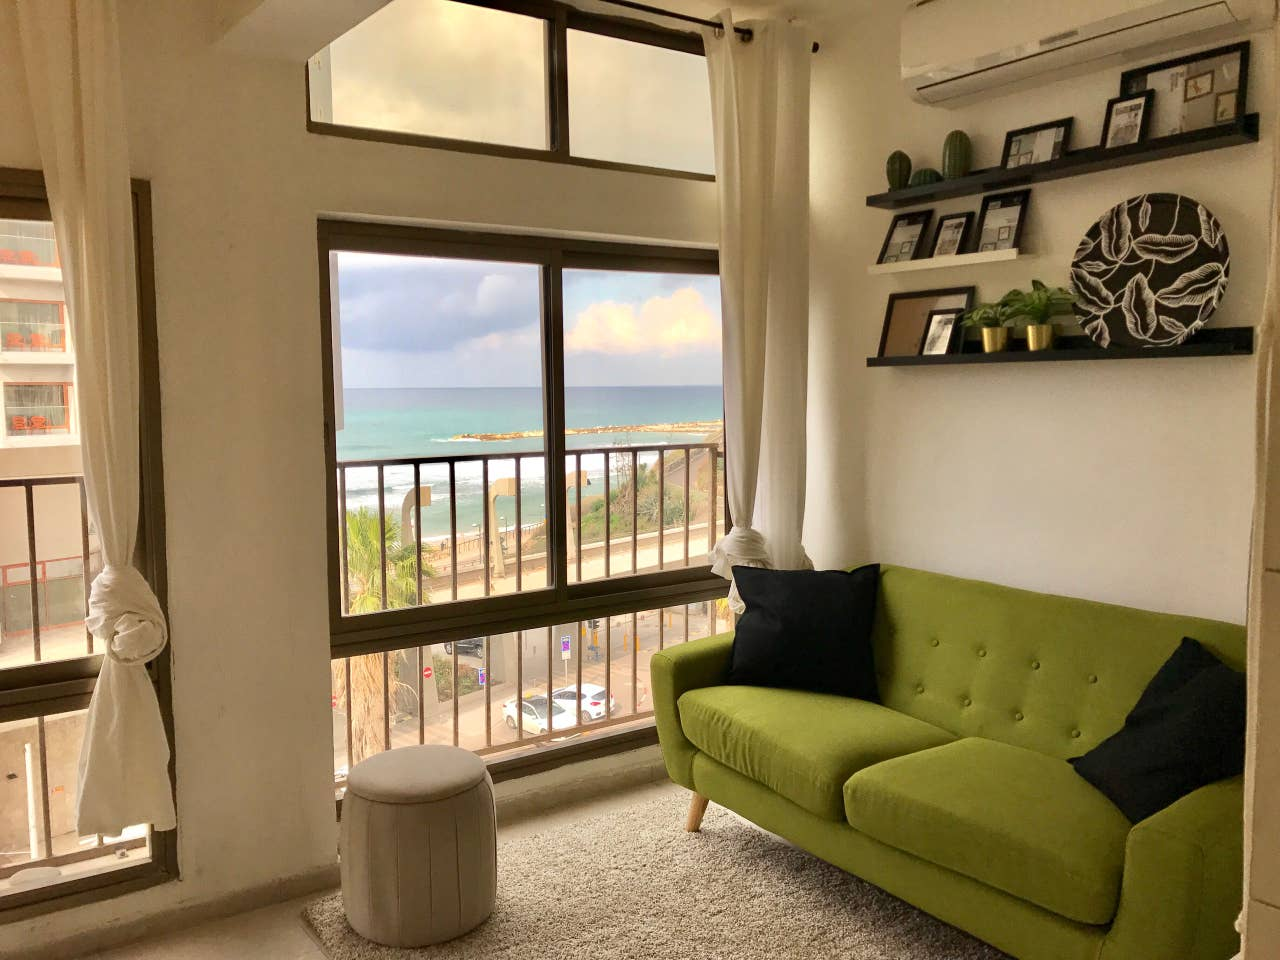 Apartment Sea View 2 bedroom Apartment Tel Aviv Hayarkon photo 28640918